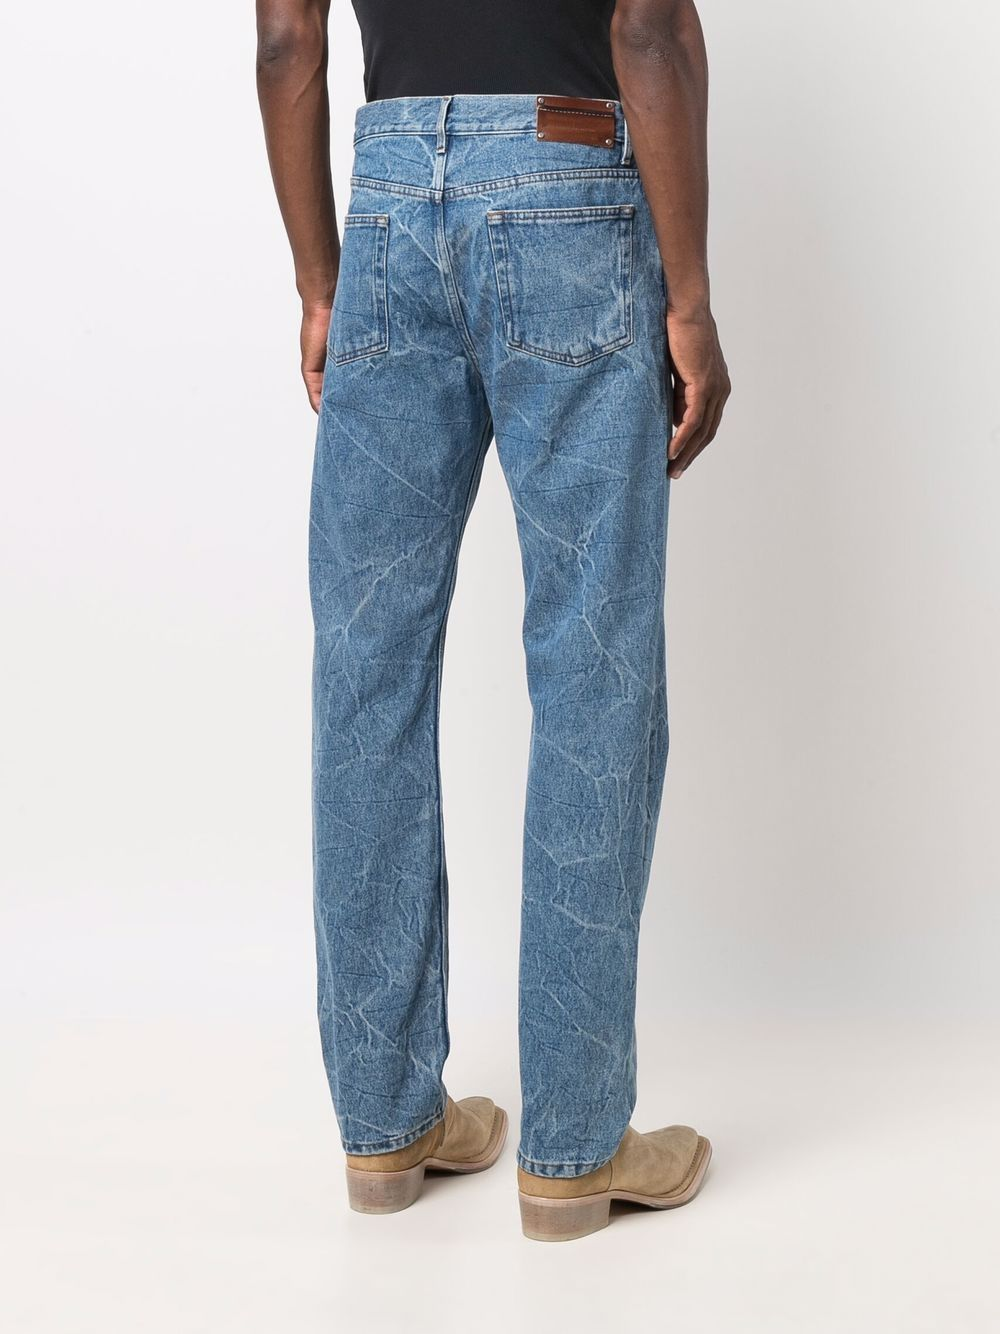 jeans penna uomo in cotone DRIES VAN NOTEN | Pantaloni | PENNA 3381504